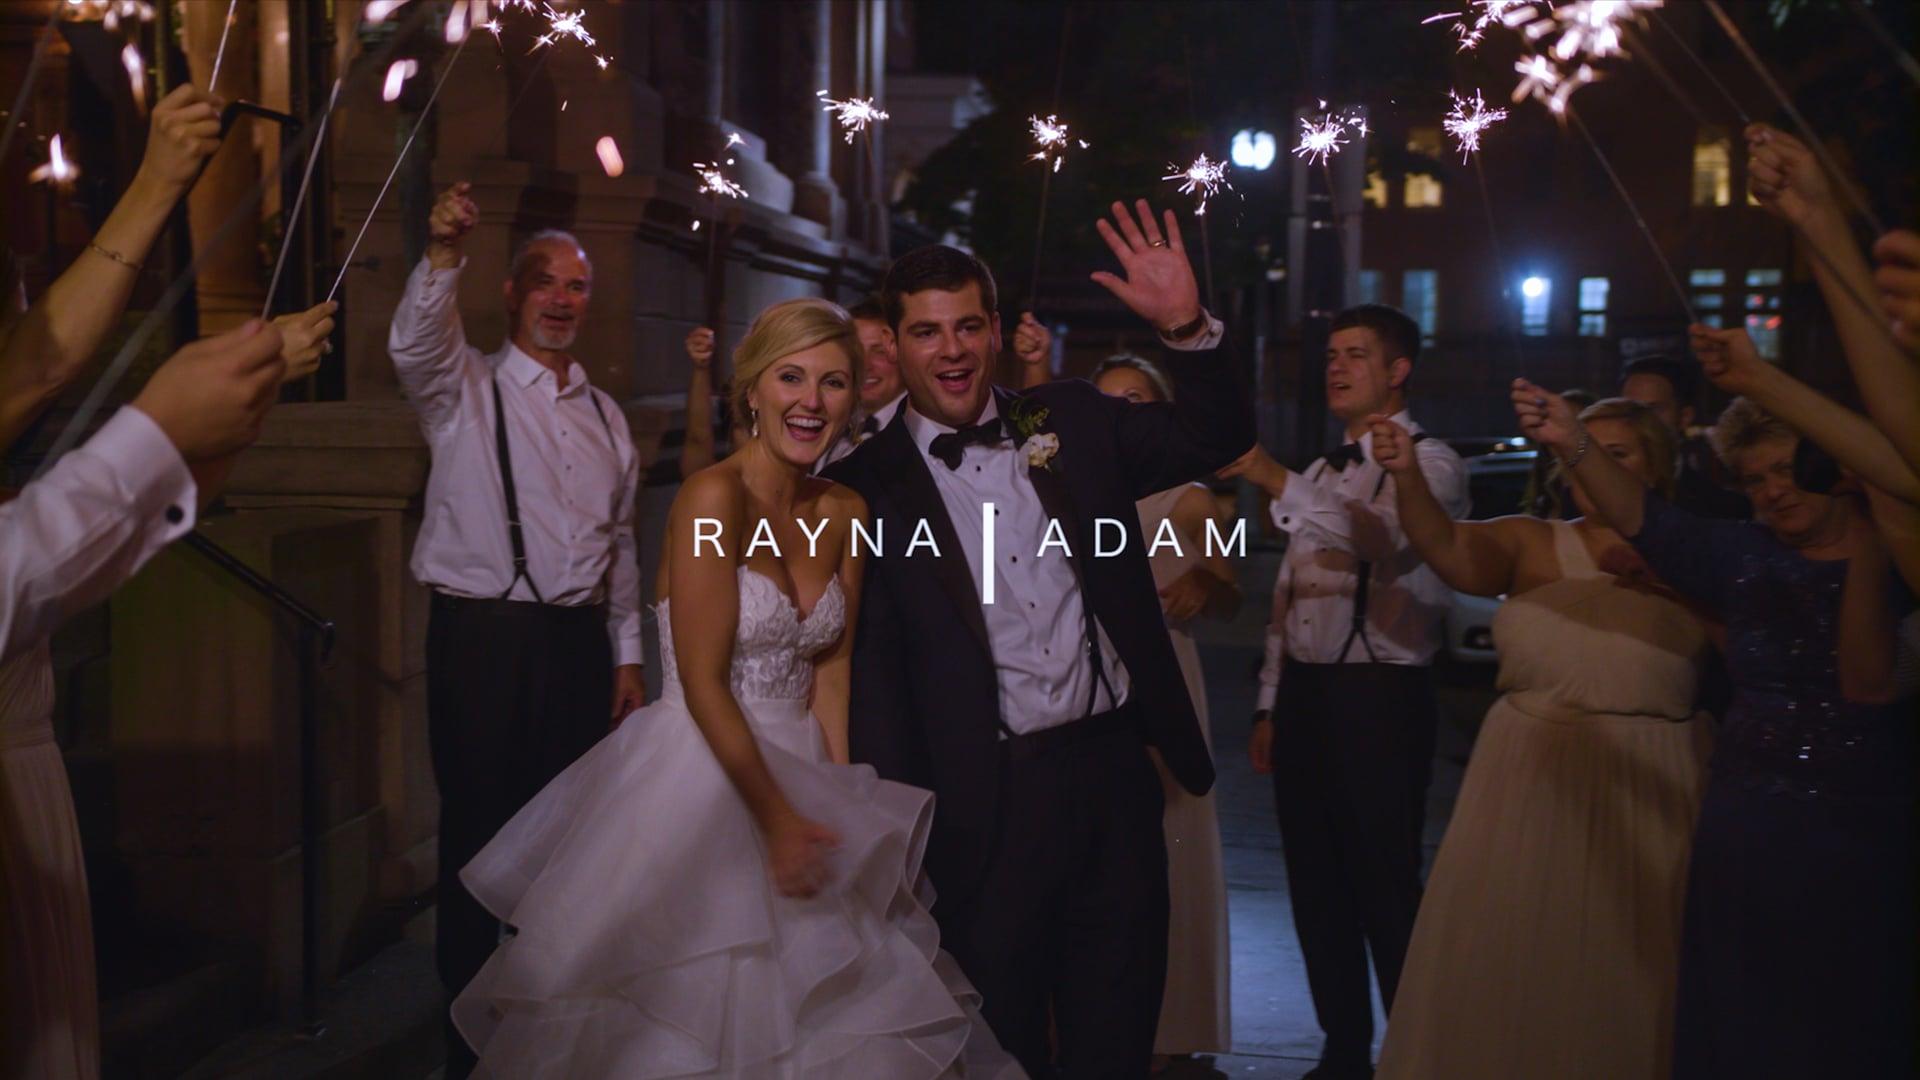 Rayna & Adam